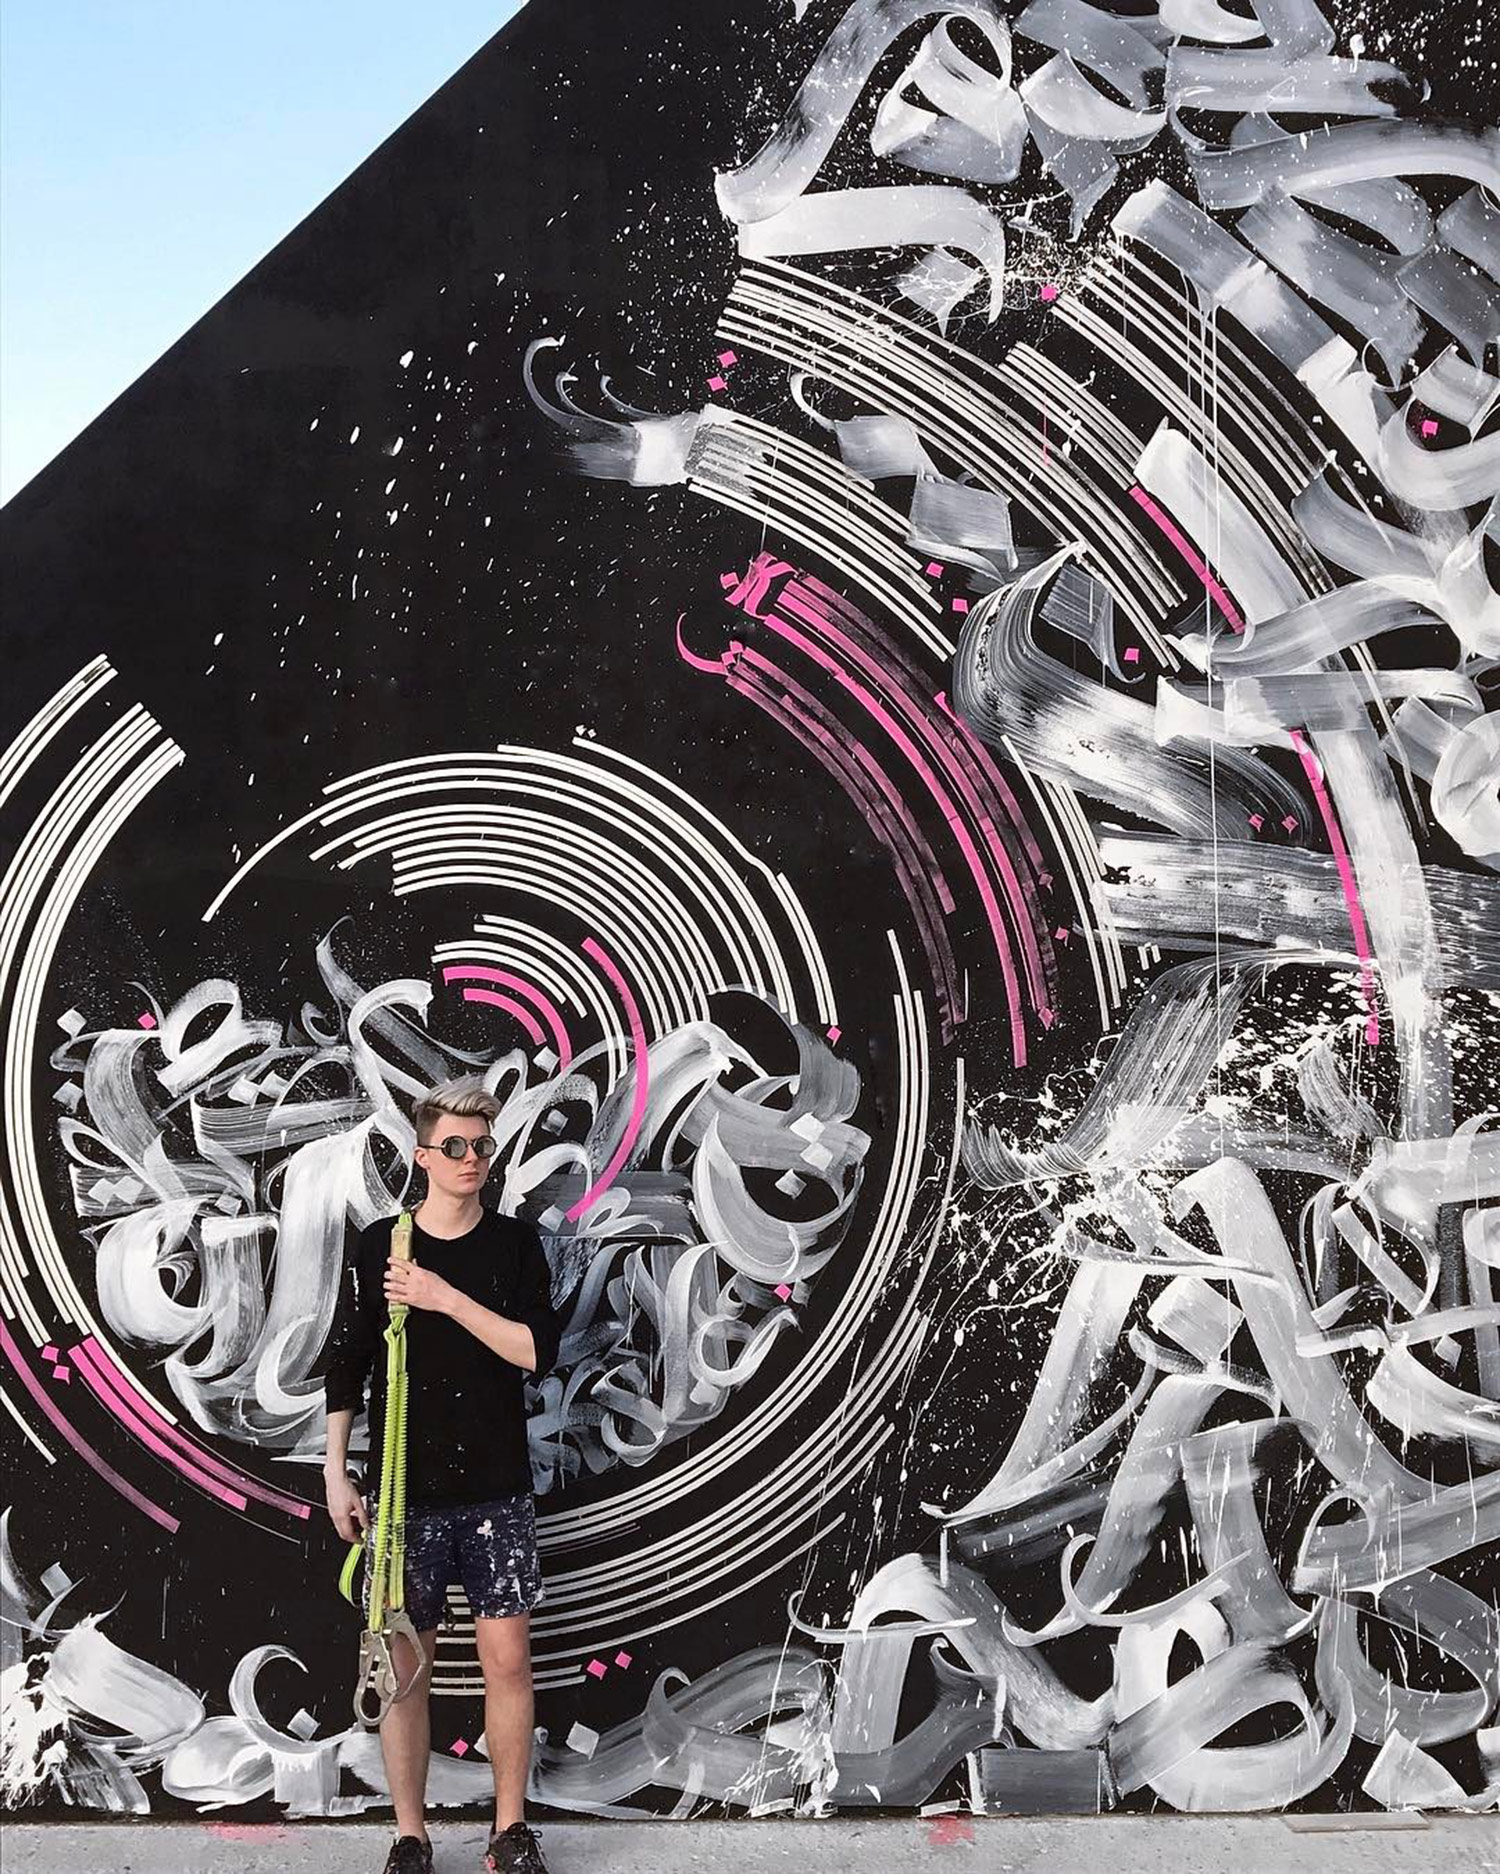 Pokras Lampas - portrait in front of mural